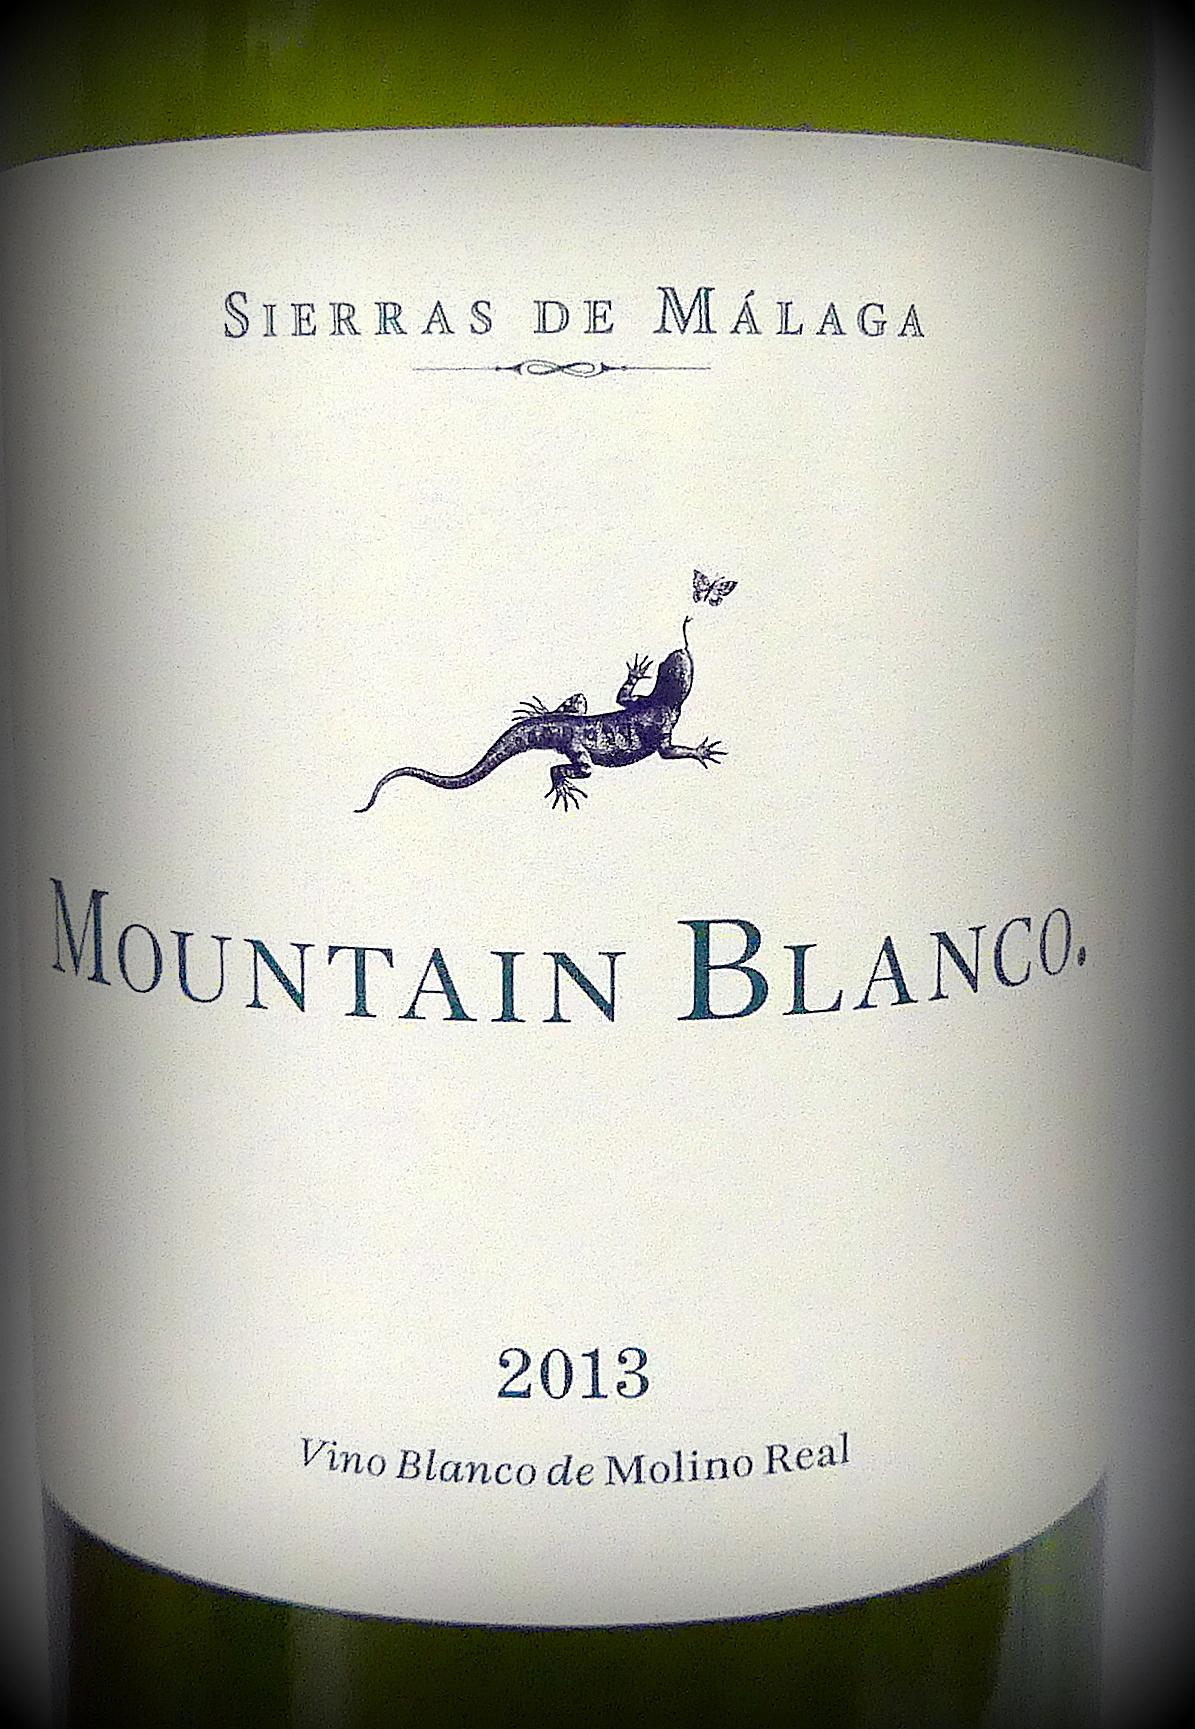 Mountain Blanco